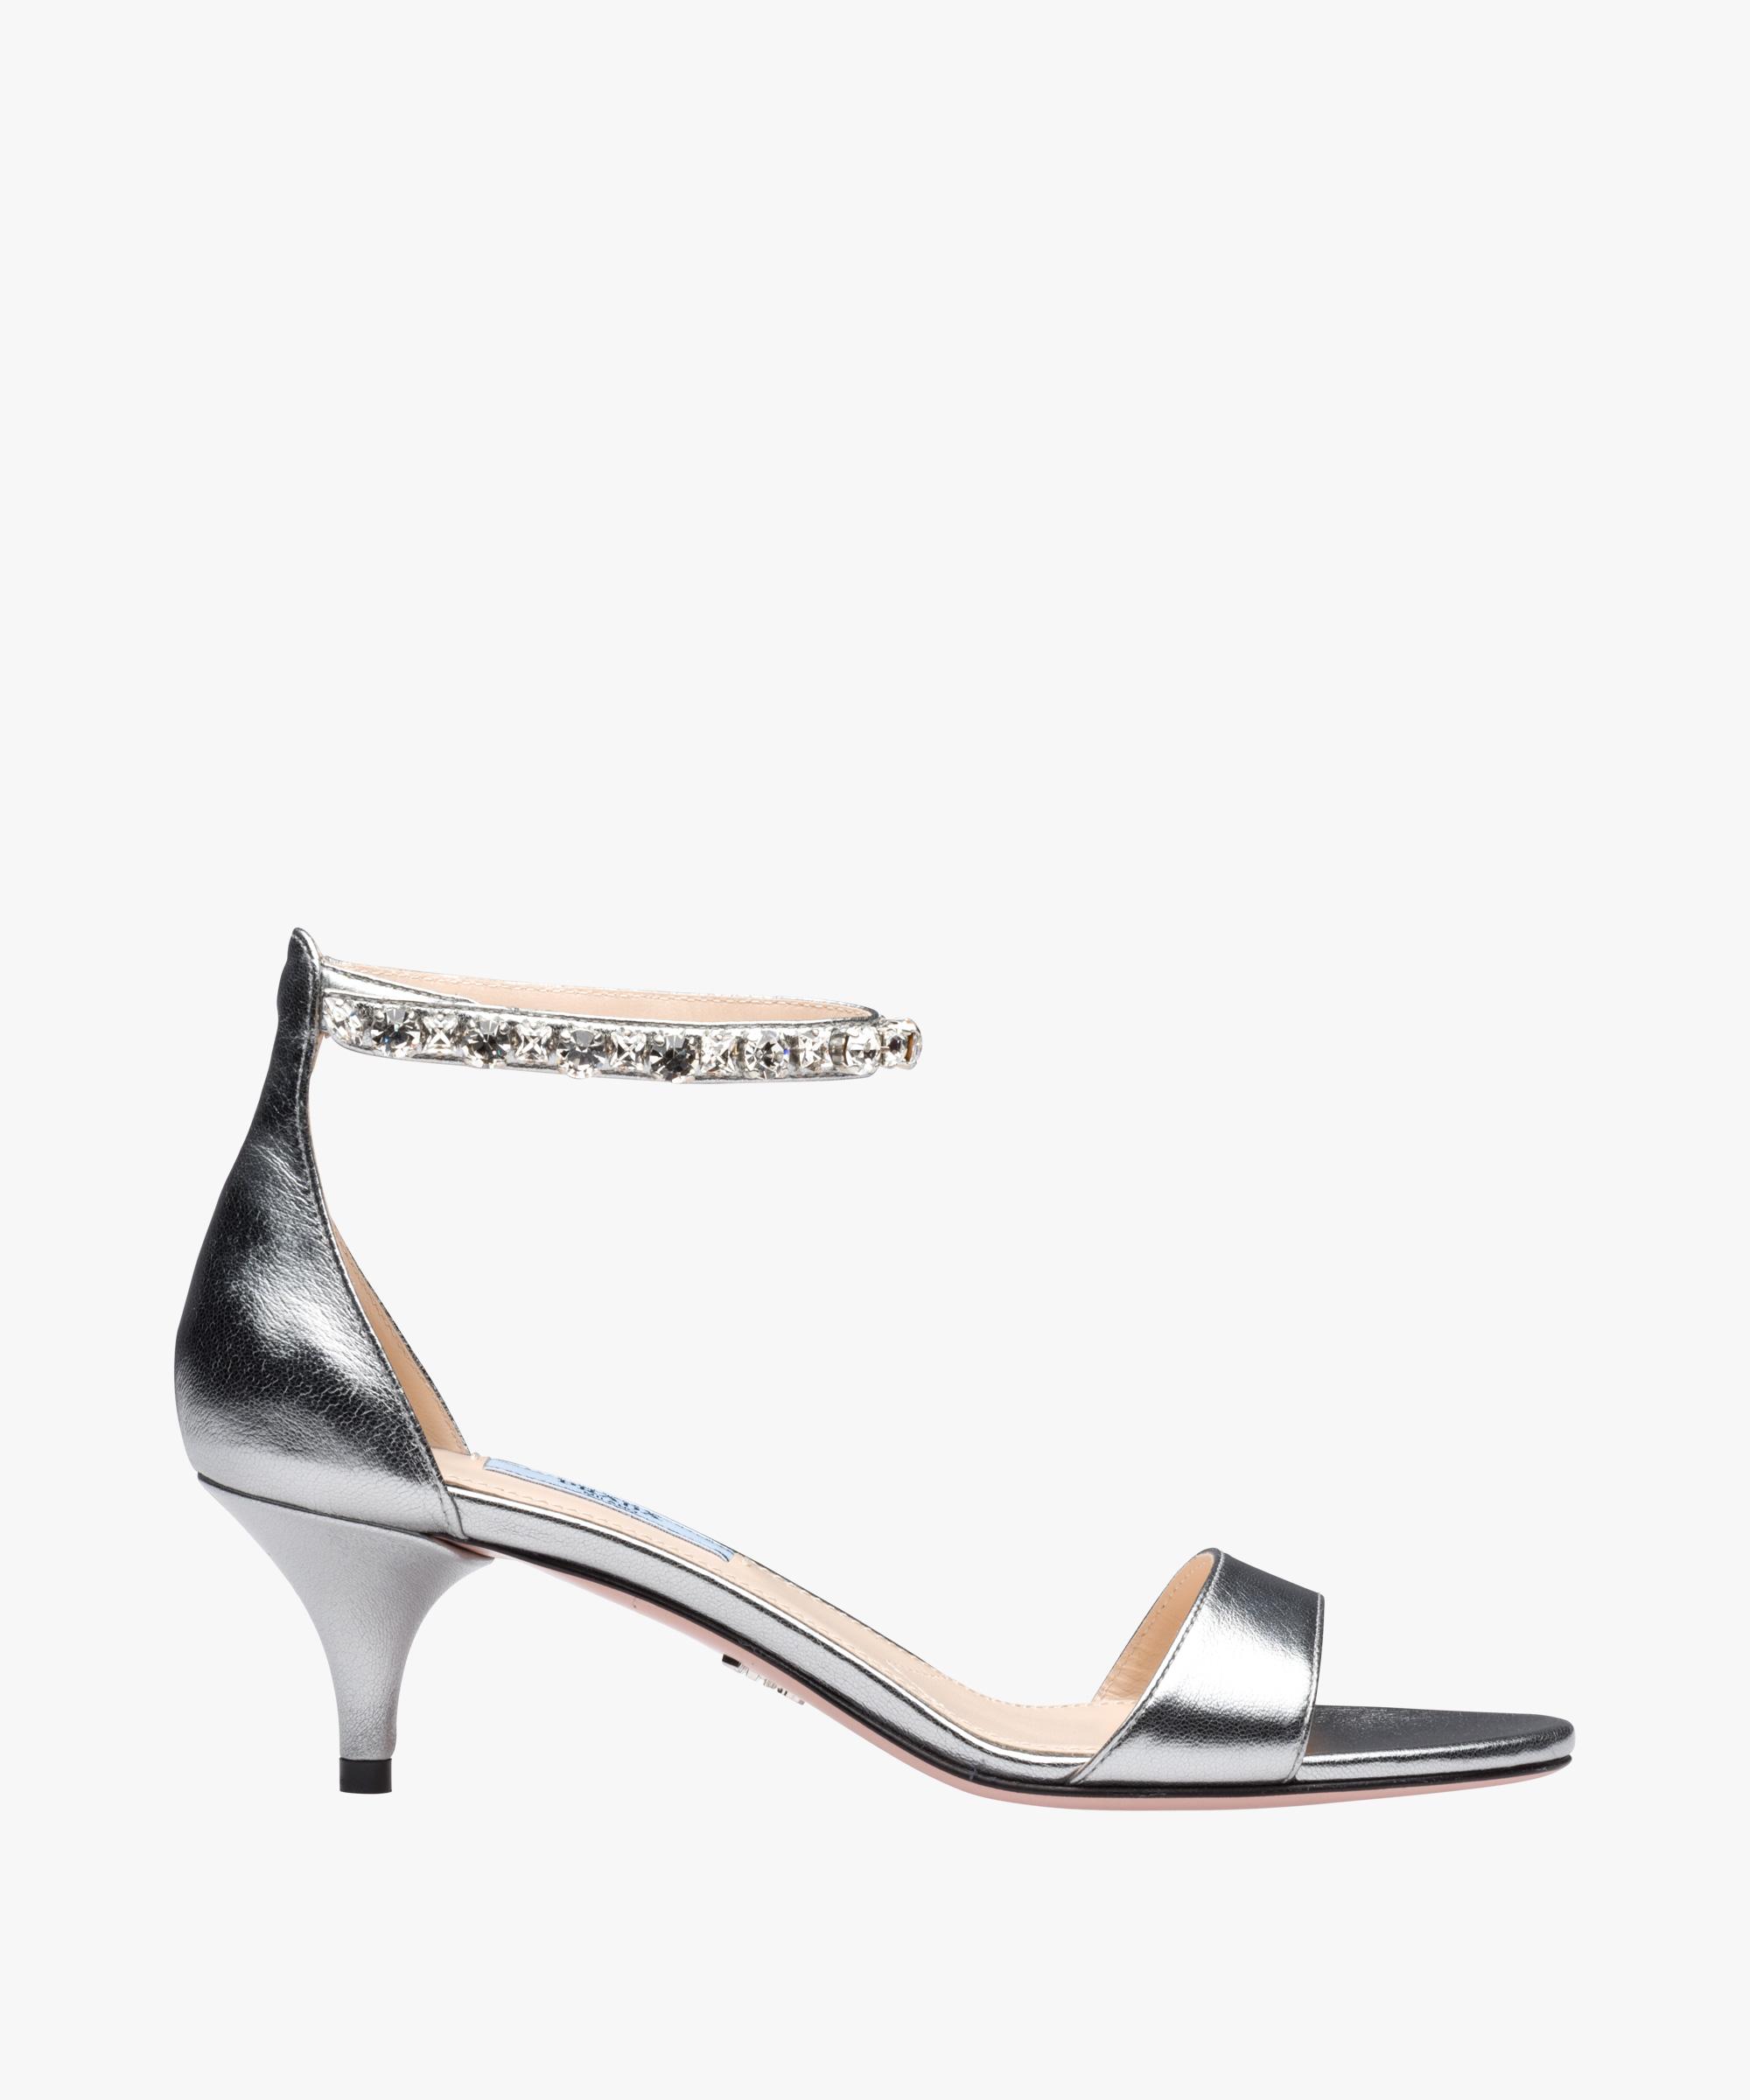 Sandali gioiello argento Prada estate 2018